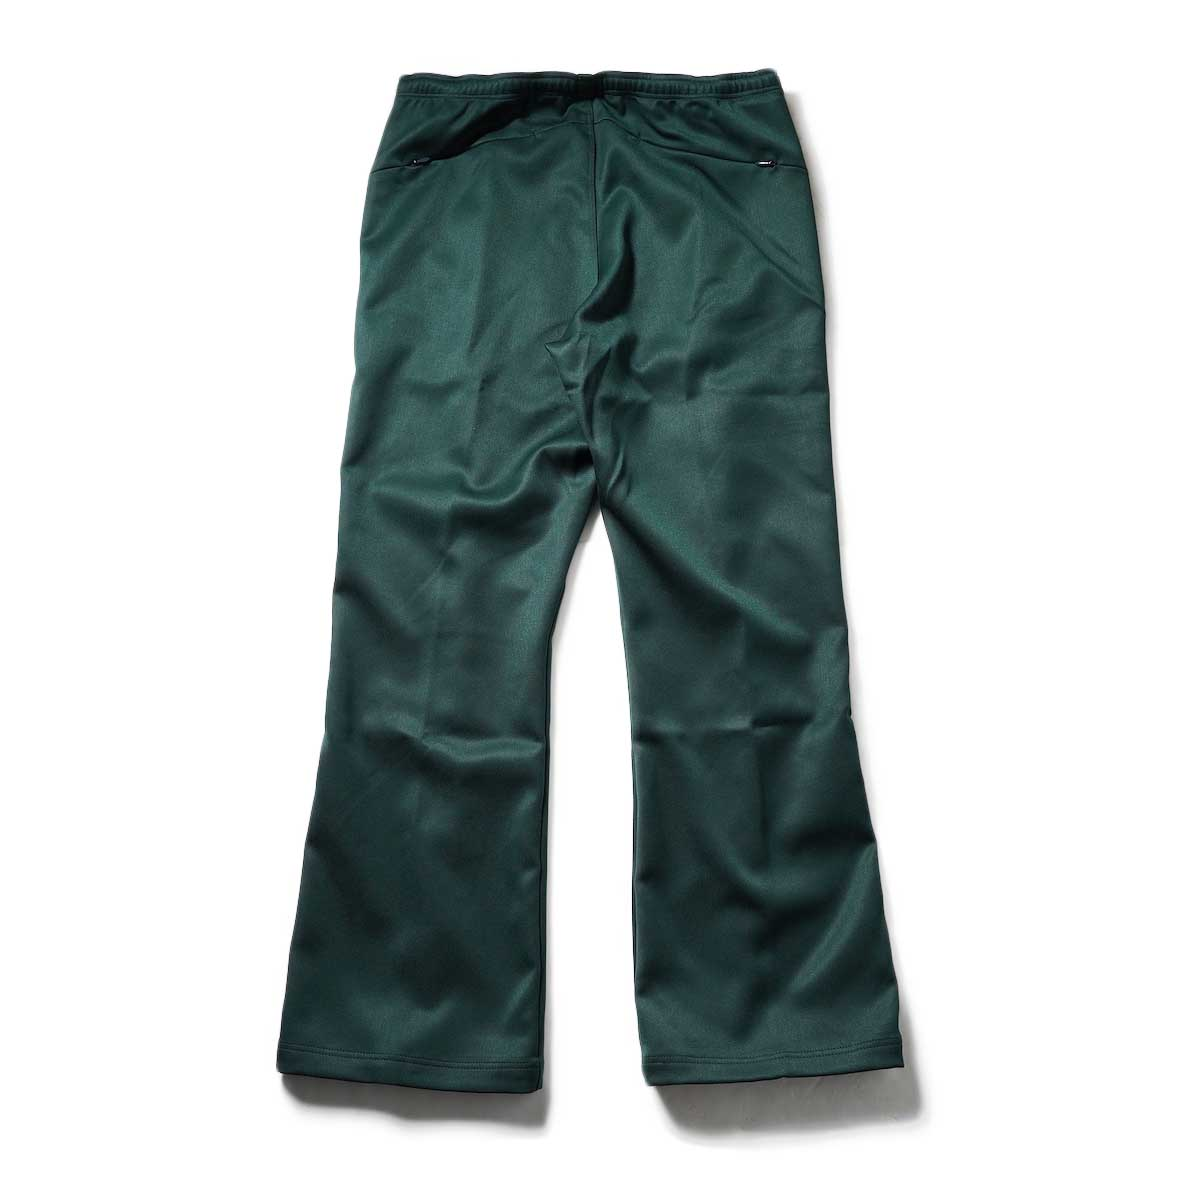 Needles / W.U. BOOT-CUT PANT - PE/R DOESKIN (Green)背面